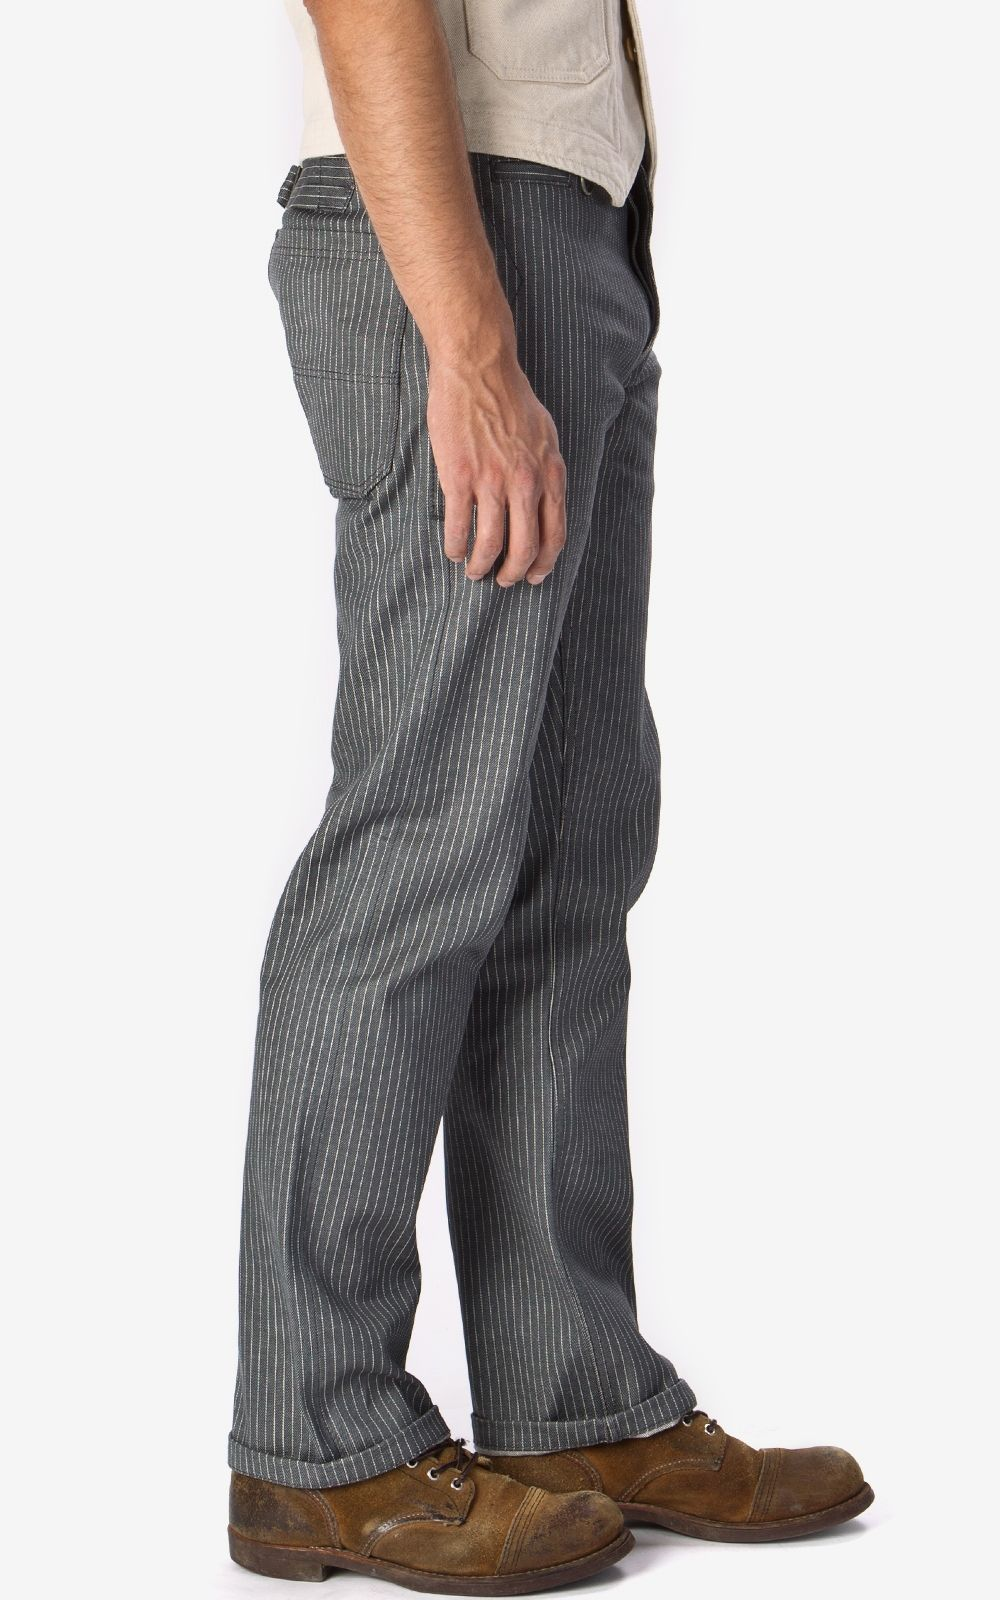 38f3618748627 Pike Brothers 1942 Hunting Pant Grey Wabash | bottoms moodboard ...